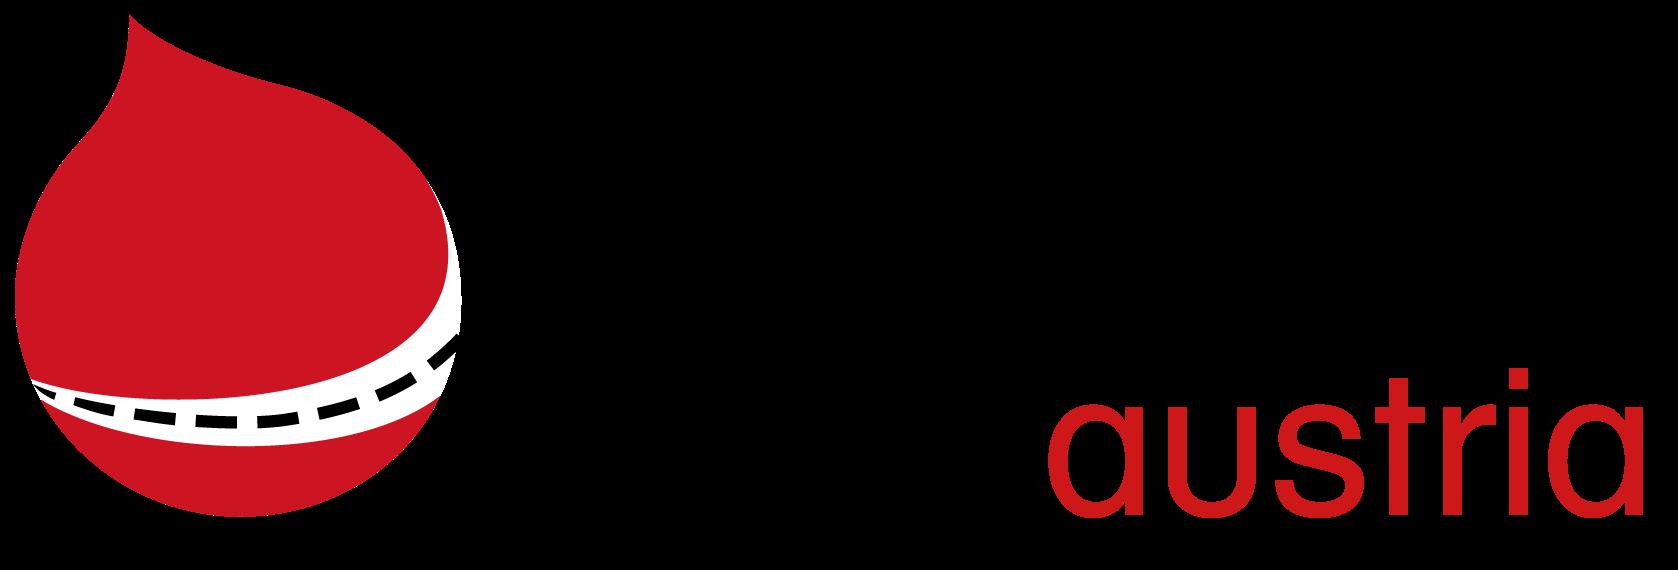 Drupal Austria Roadshow Logo